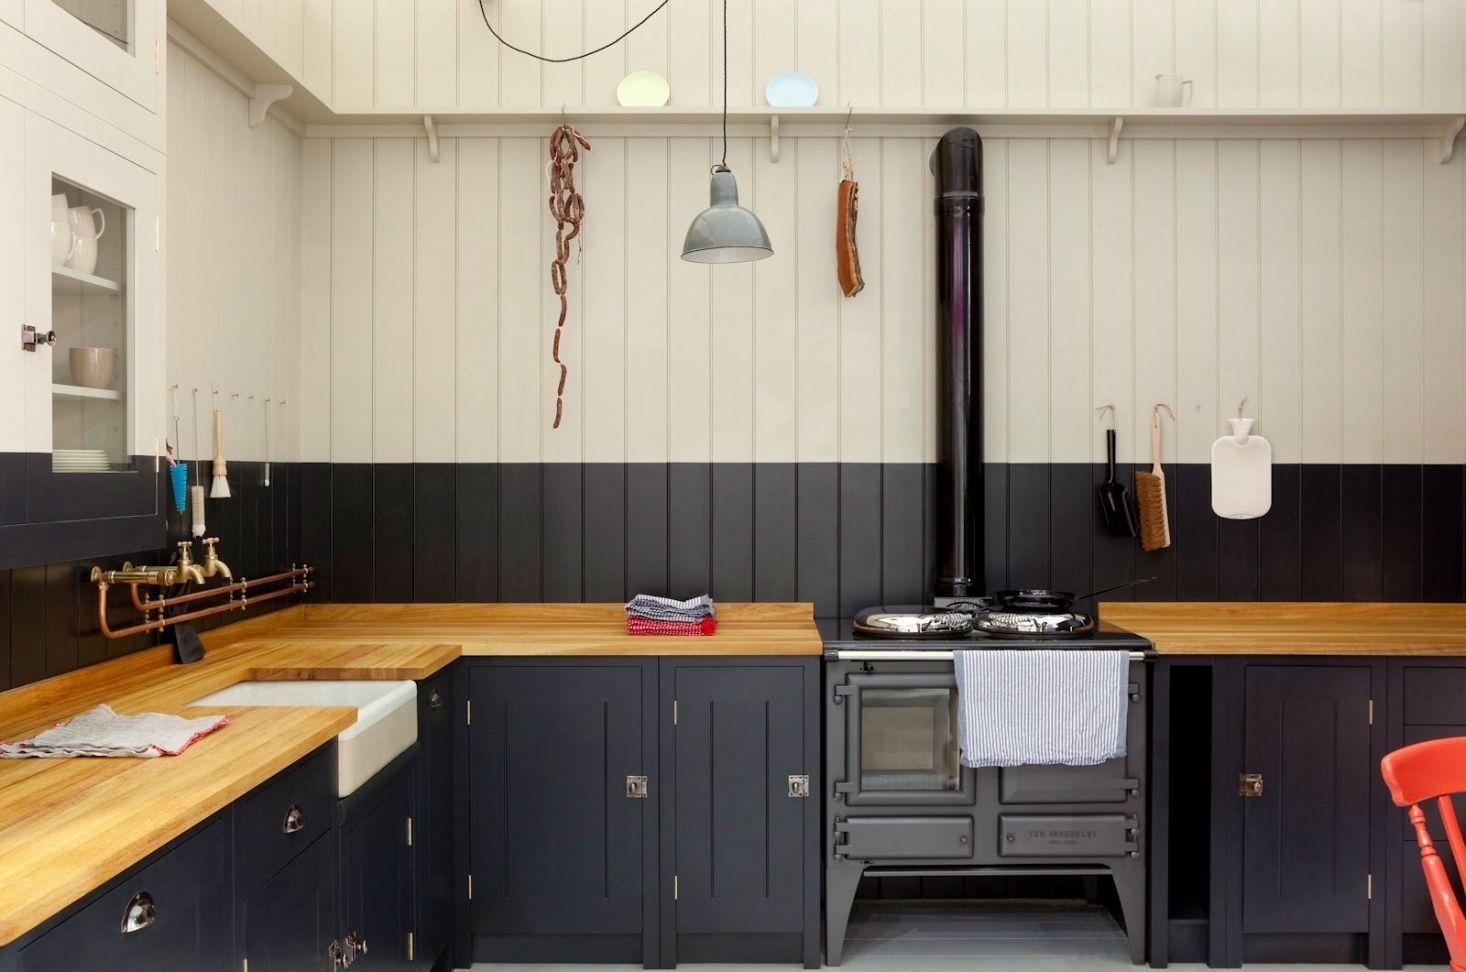 Pinfleece Mcqueen On 704 Kitchen  Pinterest  Butcher Blocks Captivating Standard Kitchen Design Decorating Inspiration